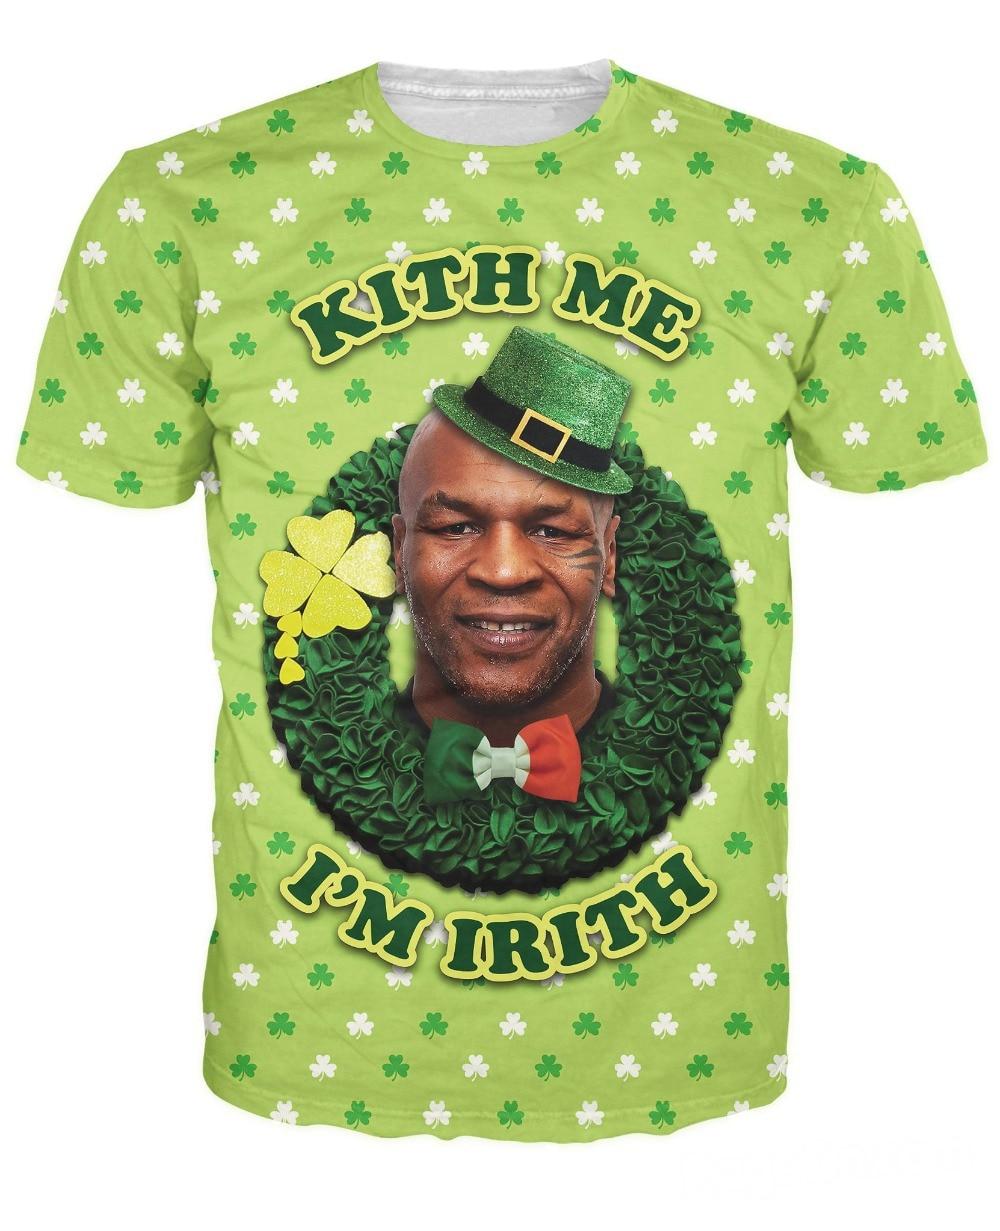 befce578 Unisex Women Men 3d Fashion Clothing tops killer Tyson Patty's Day T-Shirt  St. Patrick's Day t shirt I'm irith kith me print tee